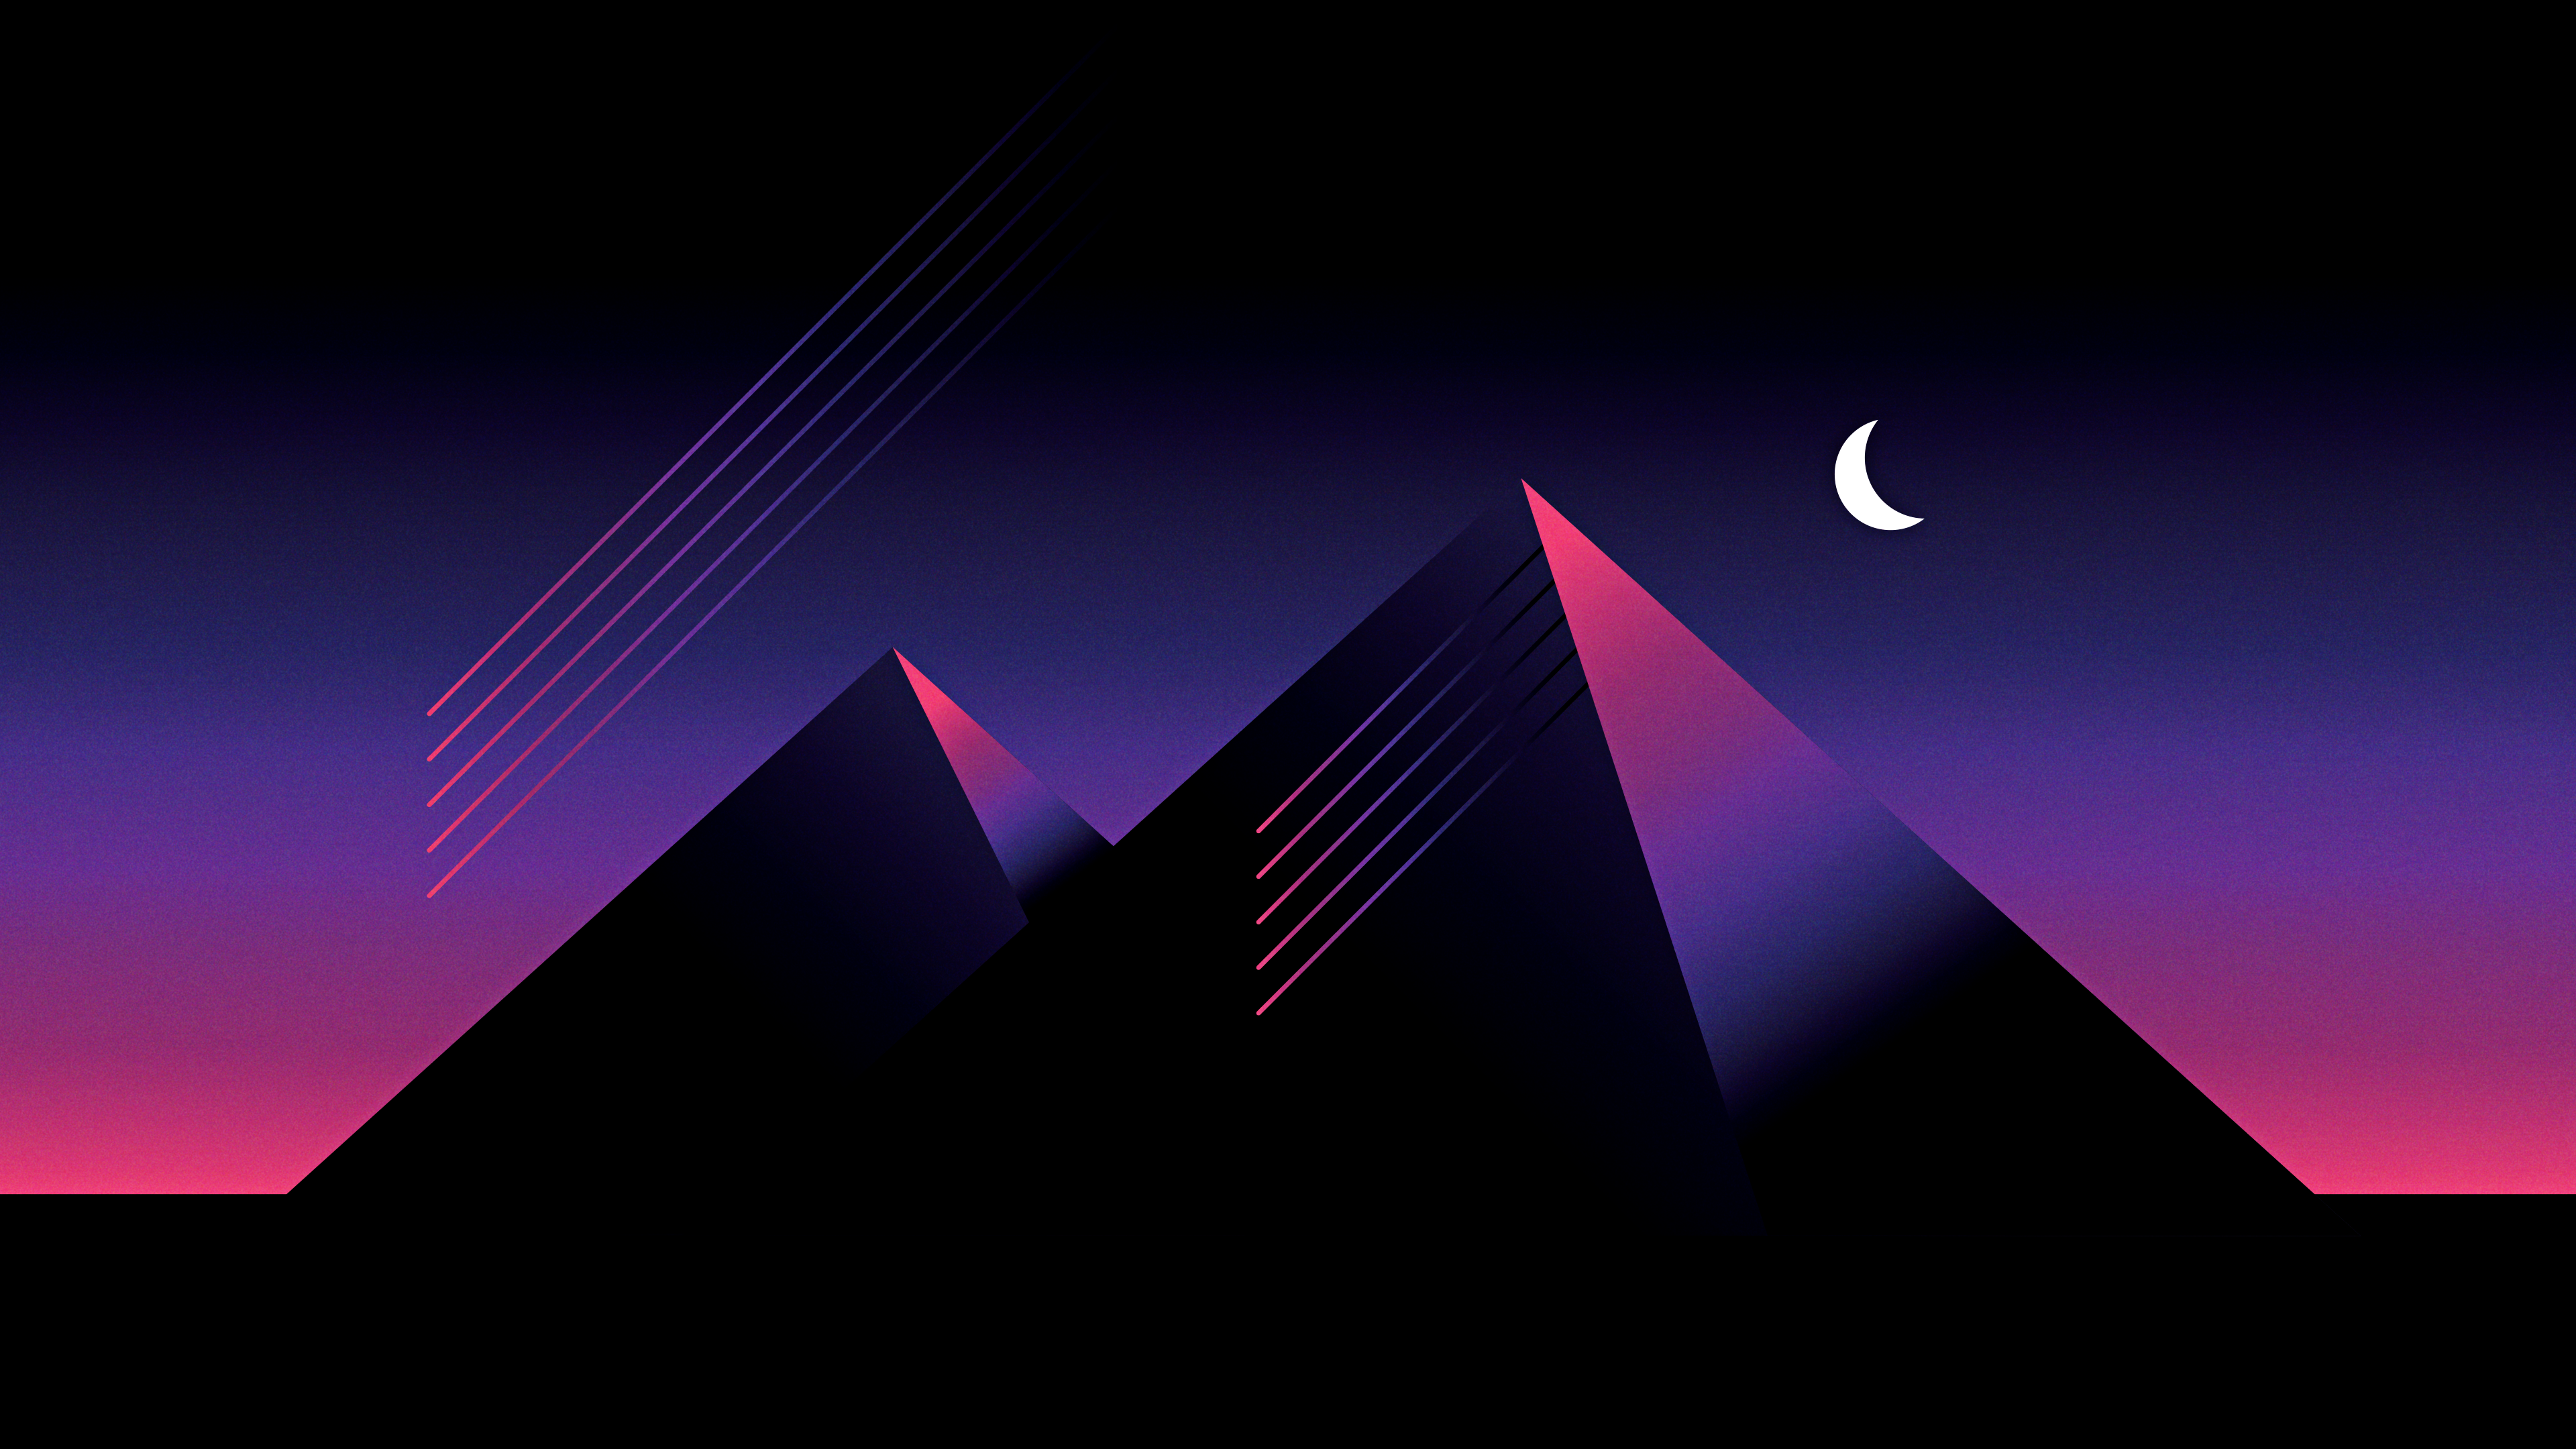 Retro Wave Pyramid [OC] [3840x2160] wallpaper 3840x2160